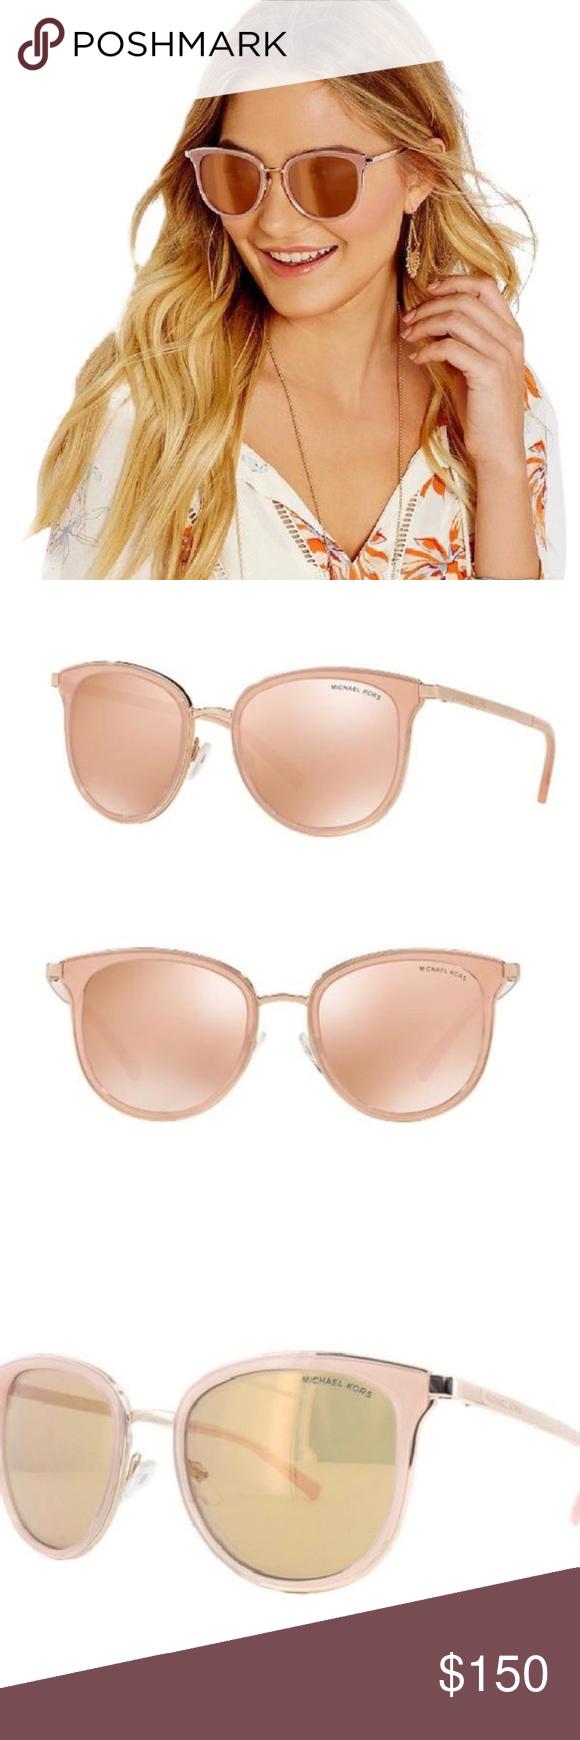 6325bd3545 Michael Kors Pink   Rose Gold Adriana Sunglasses Brand new! Authentic Michael  Kors Adriana pink   rose gold sunglasses. Frames are pink   rose gold.